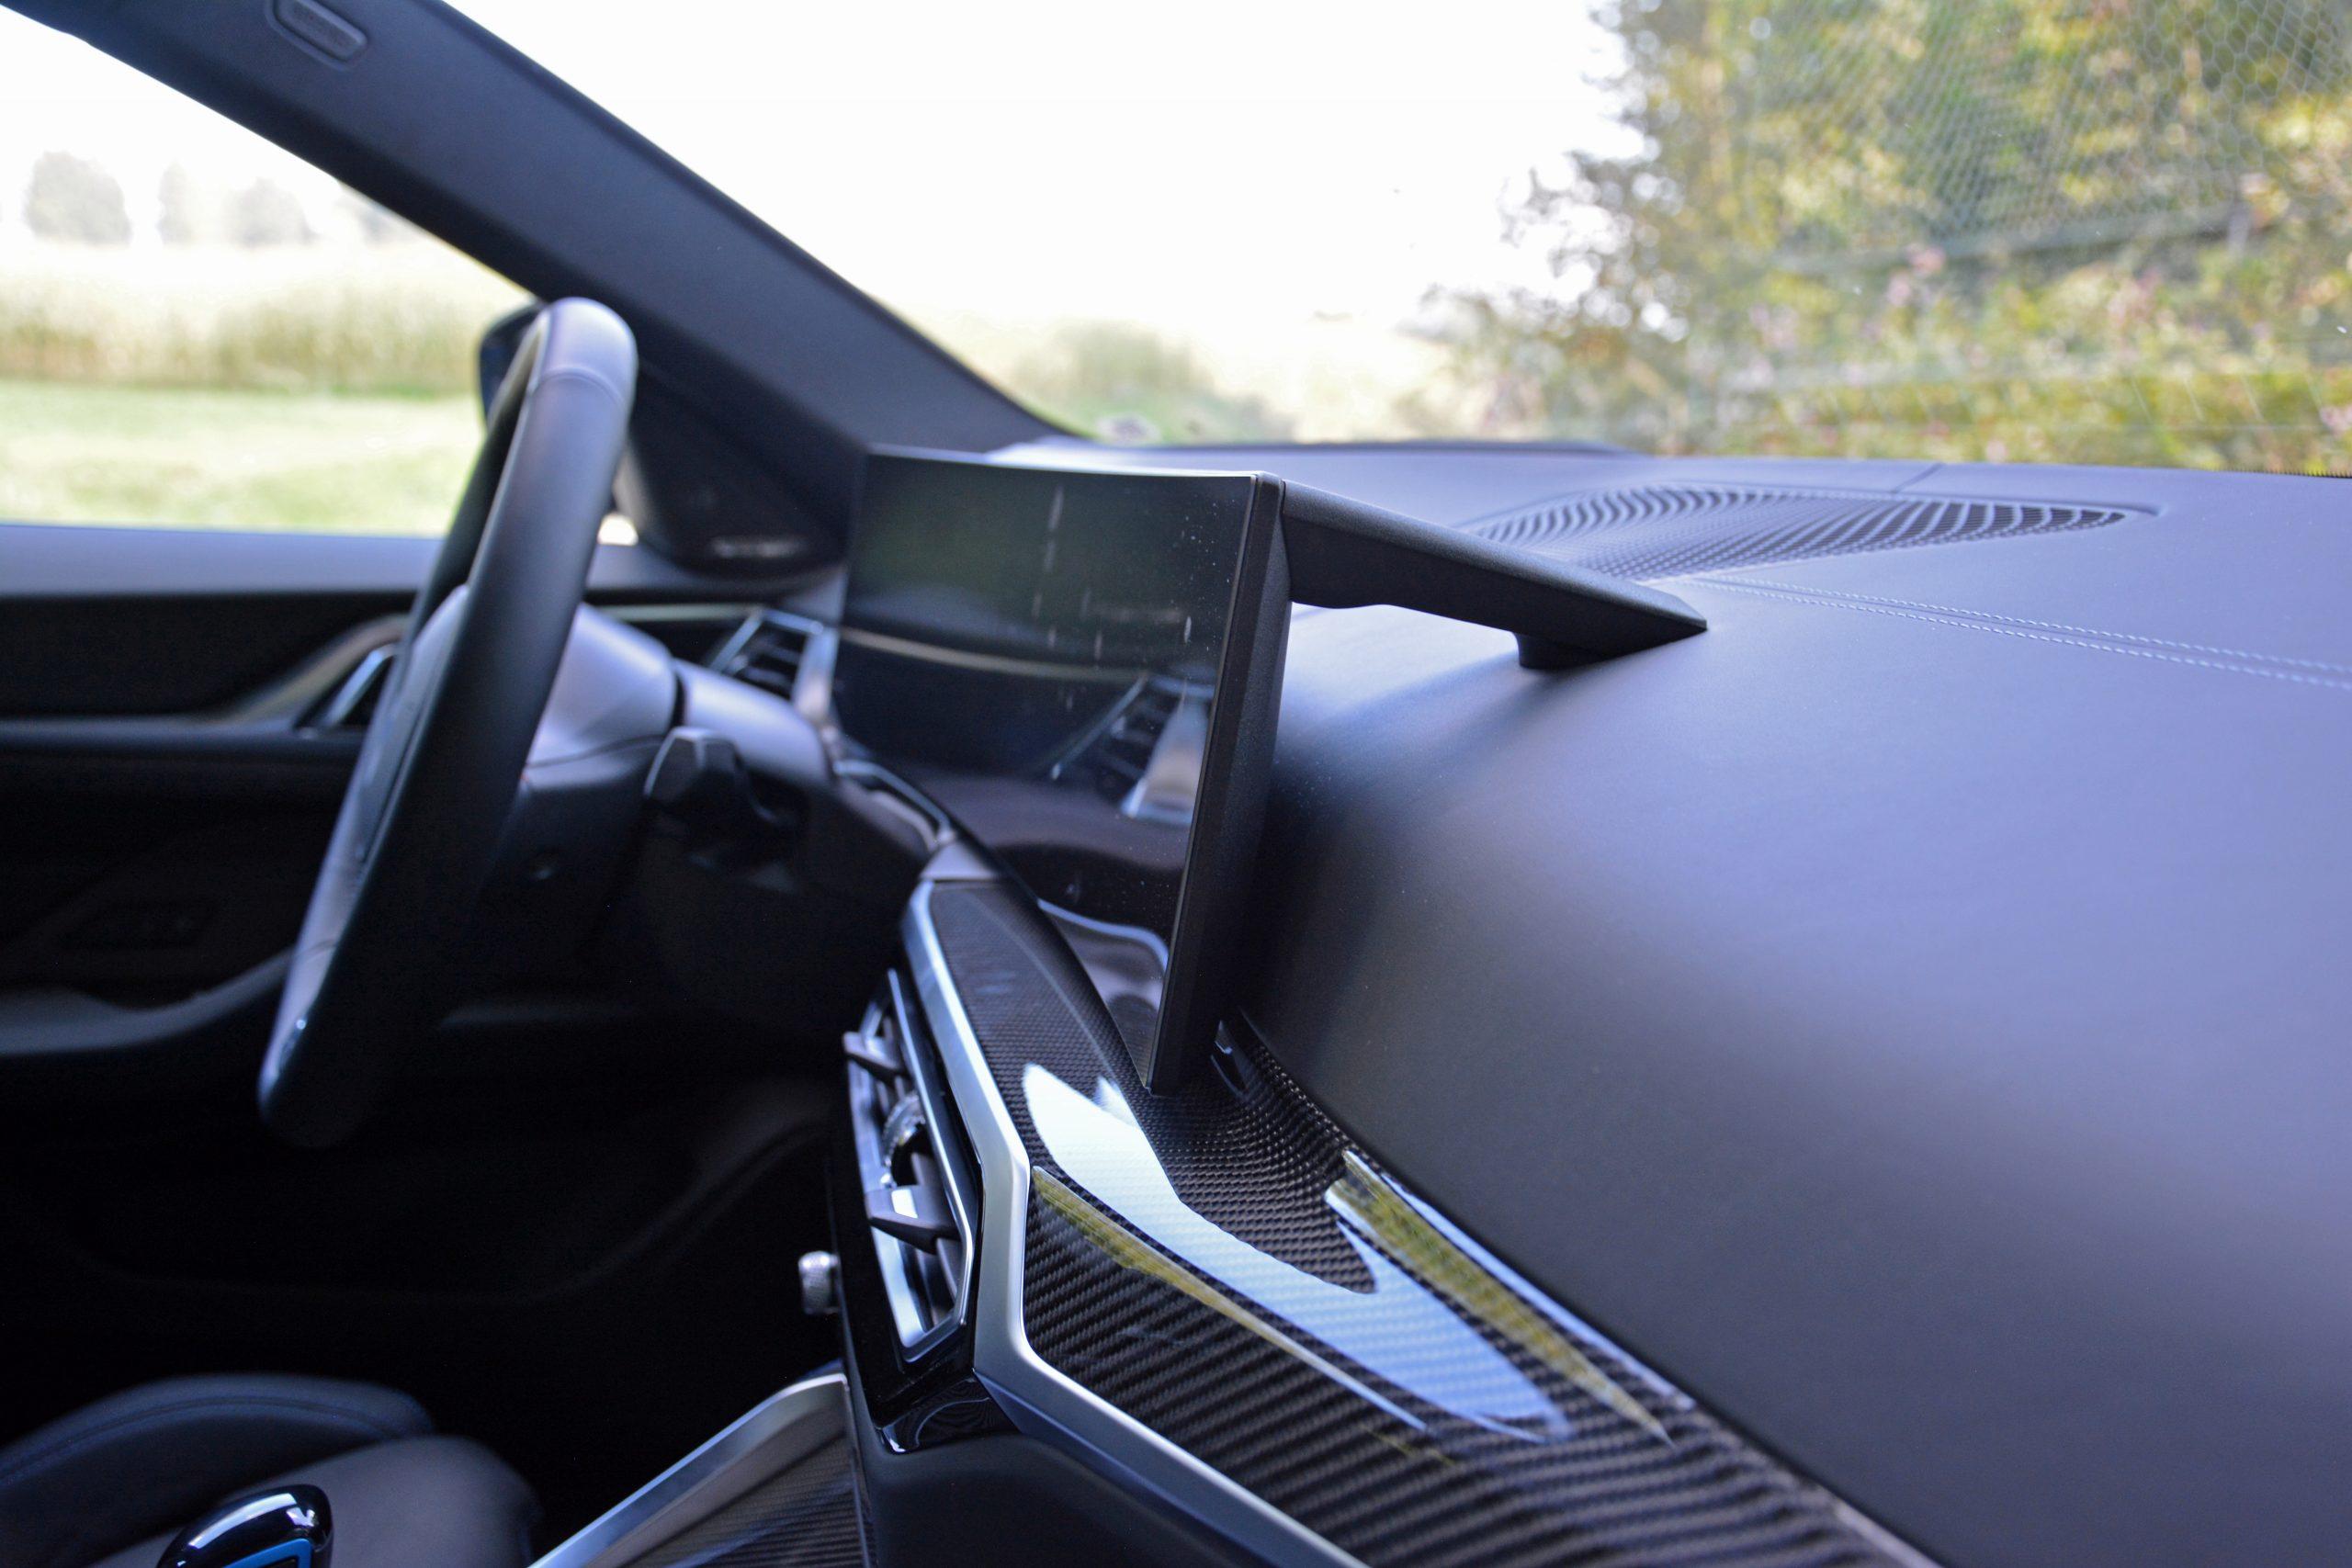 2022 BMW i4 M50 interior dash and infotainment display